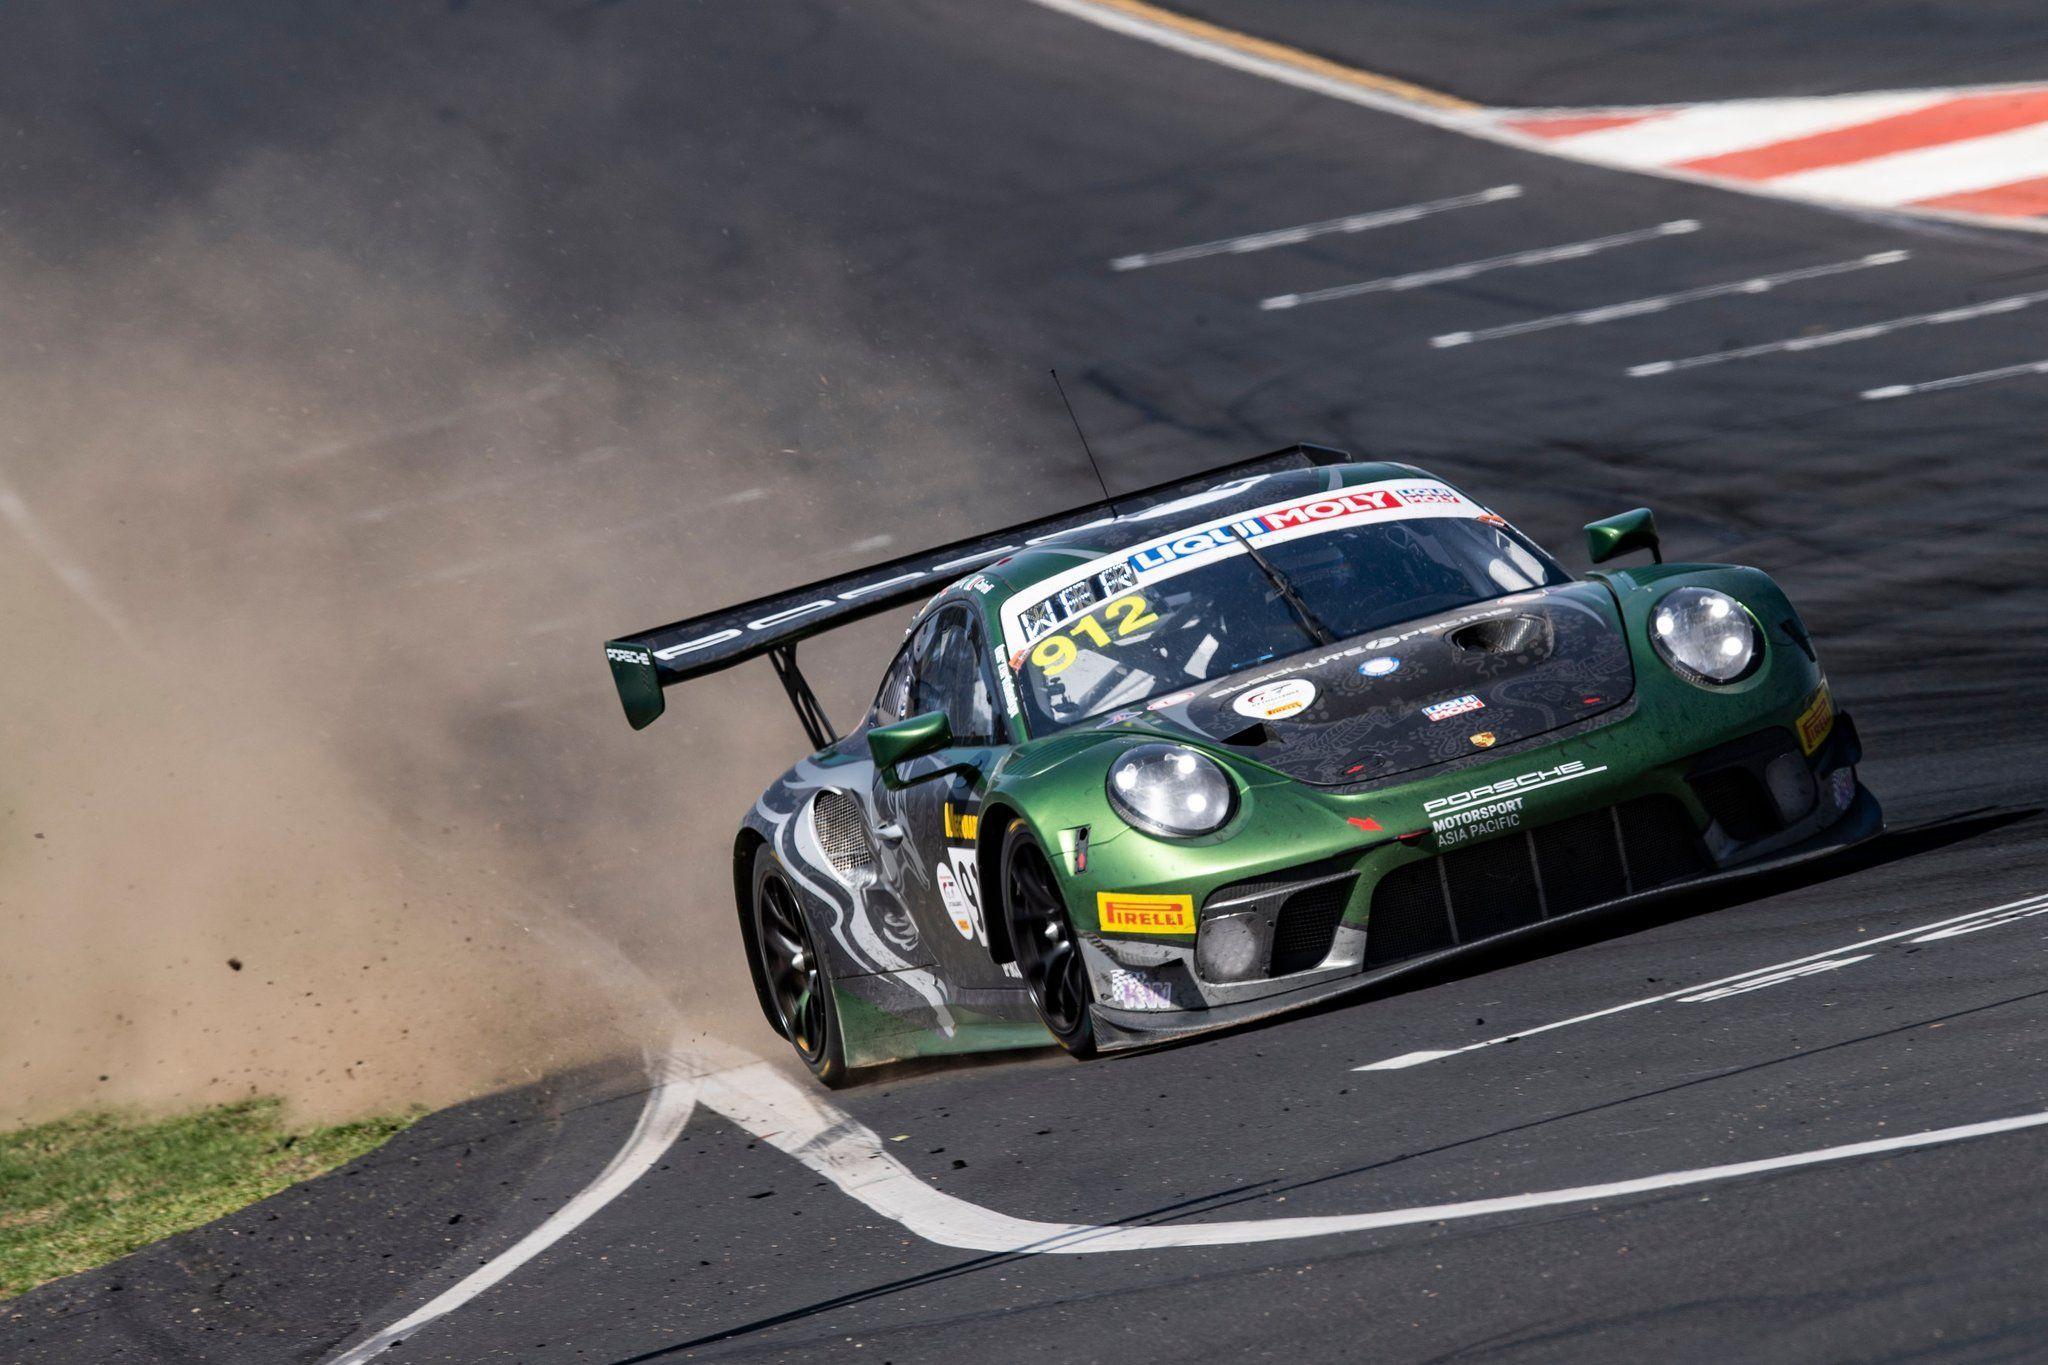 Porsche Motorsport On Twitter In 2021 Porsche Motorsport Racing Car Design Porsche